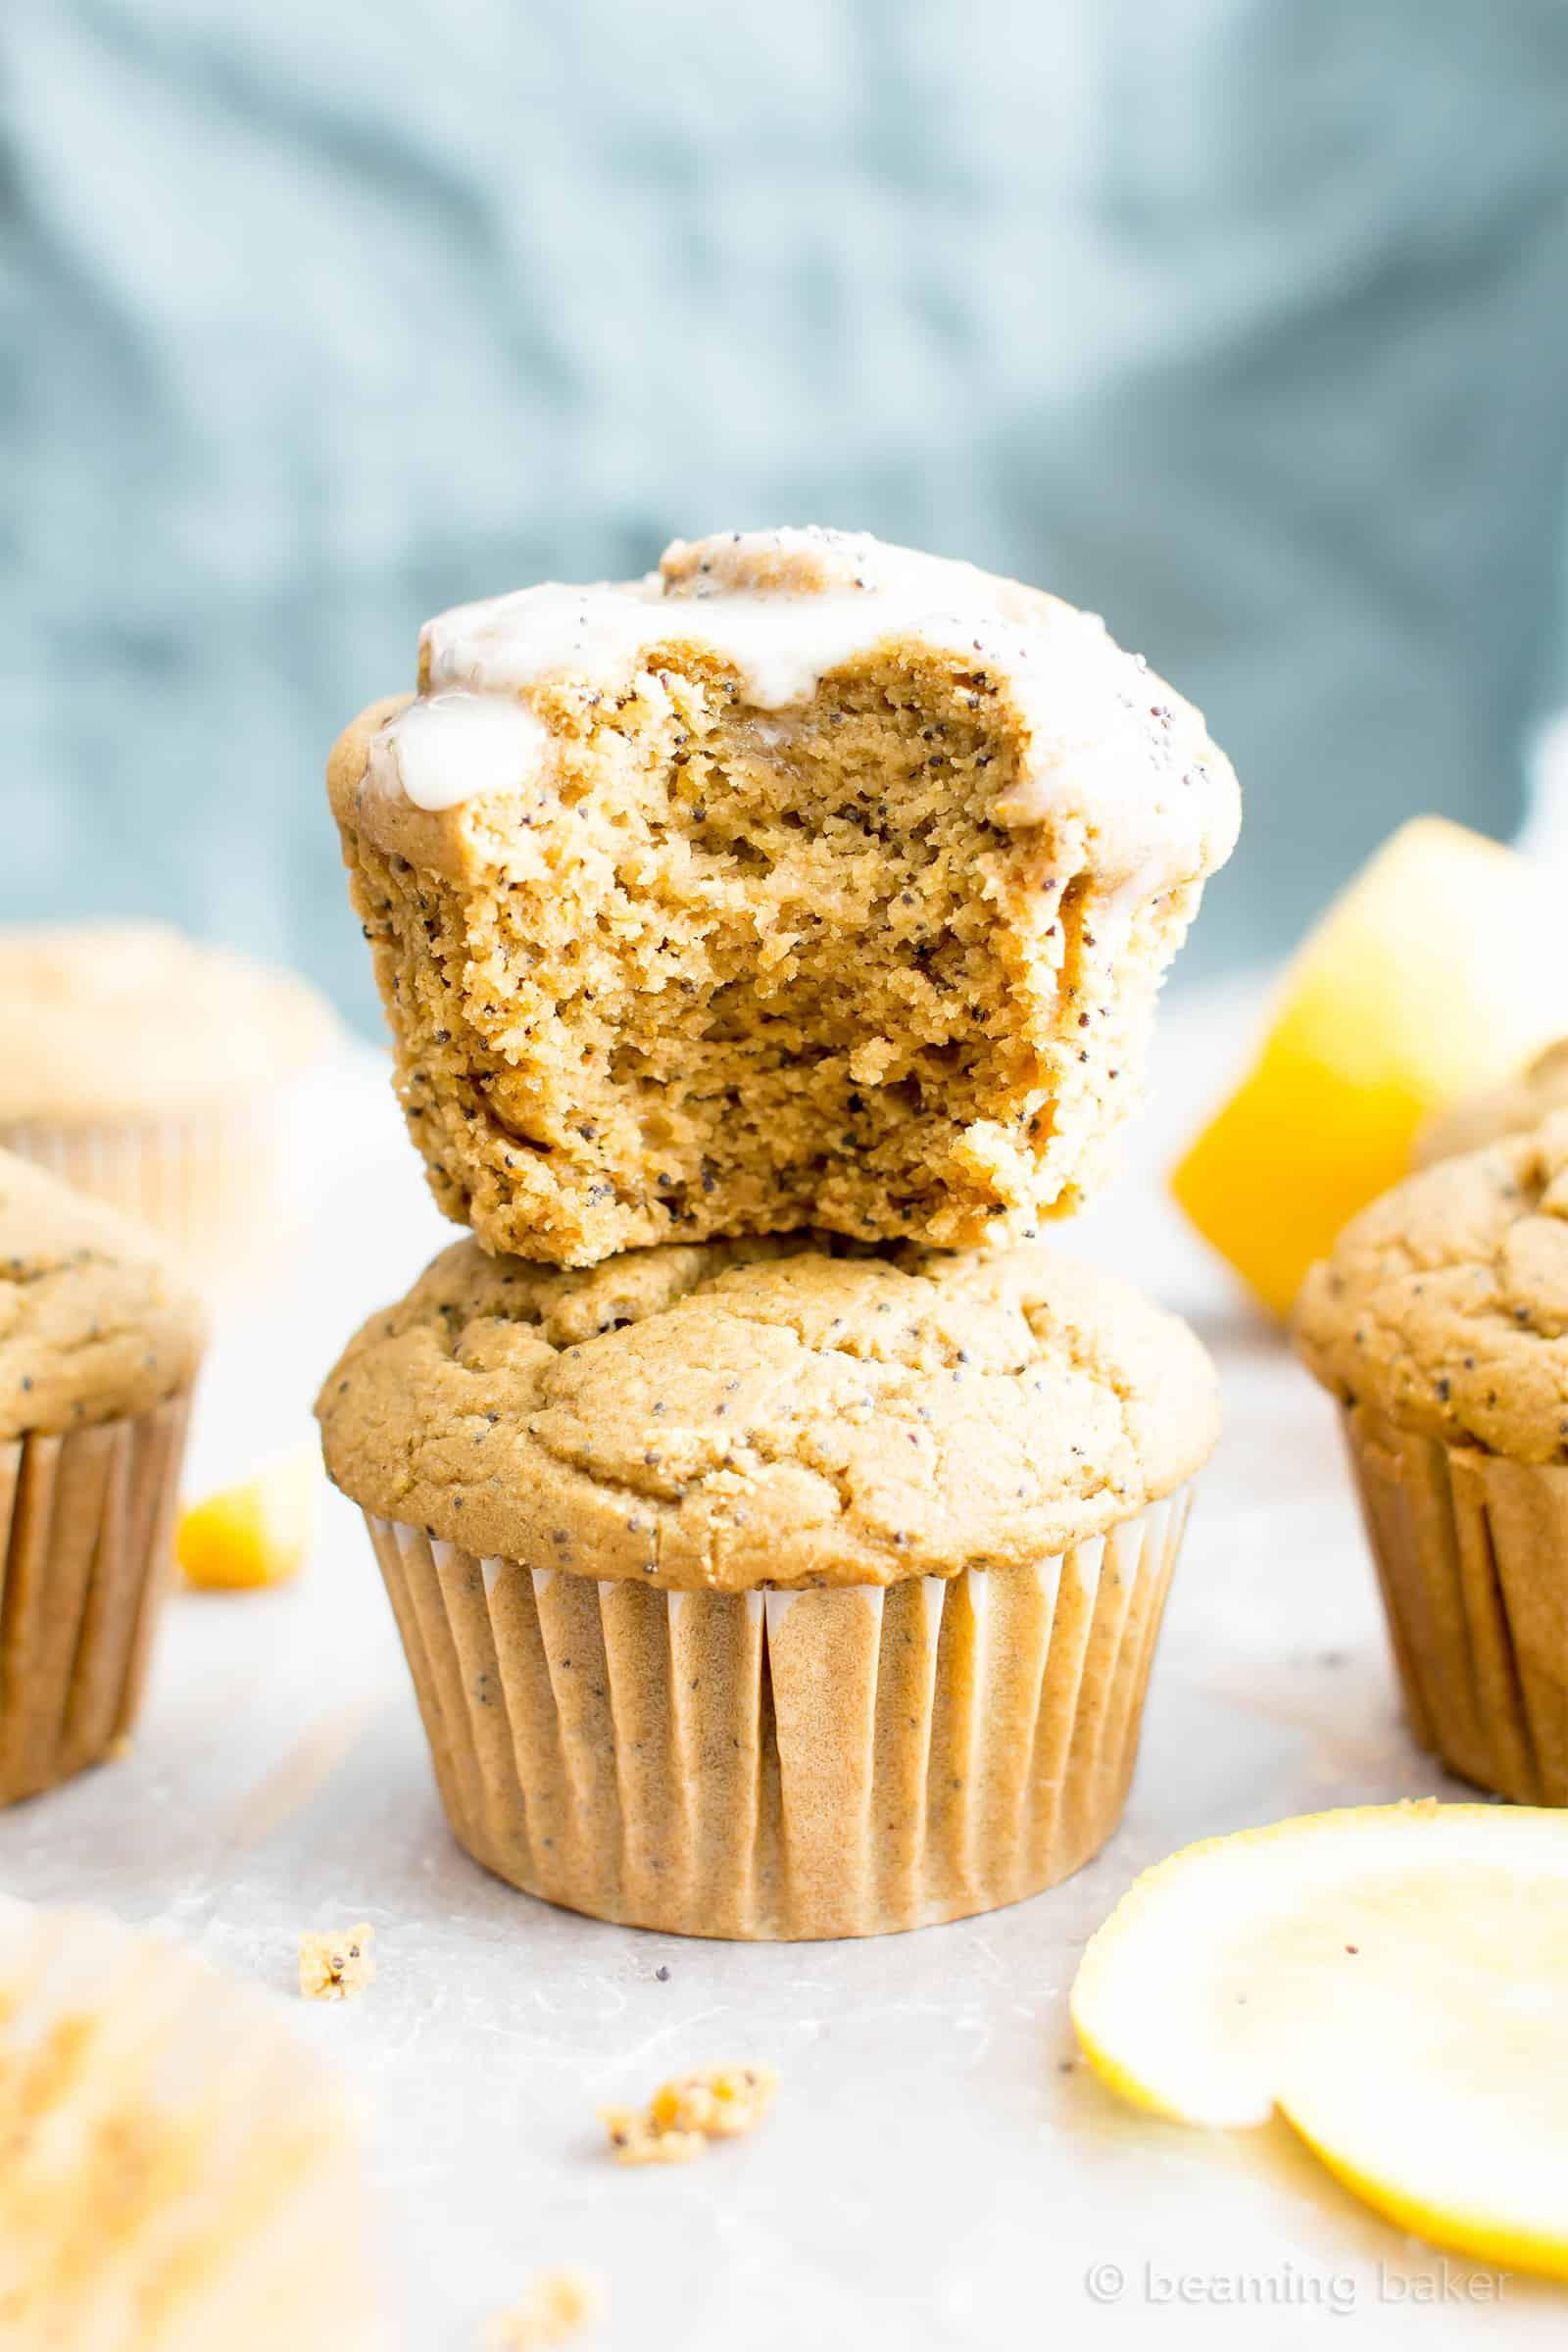 Healthy Vegan Breakfast Muffins  Healthy Lemon Poppy Seed Muffins Recipe Vegan Gluten